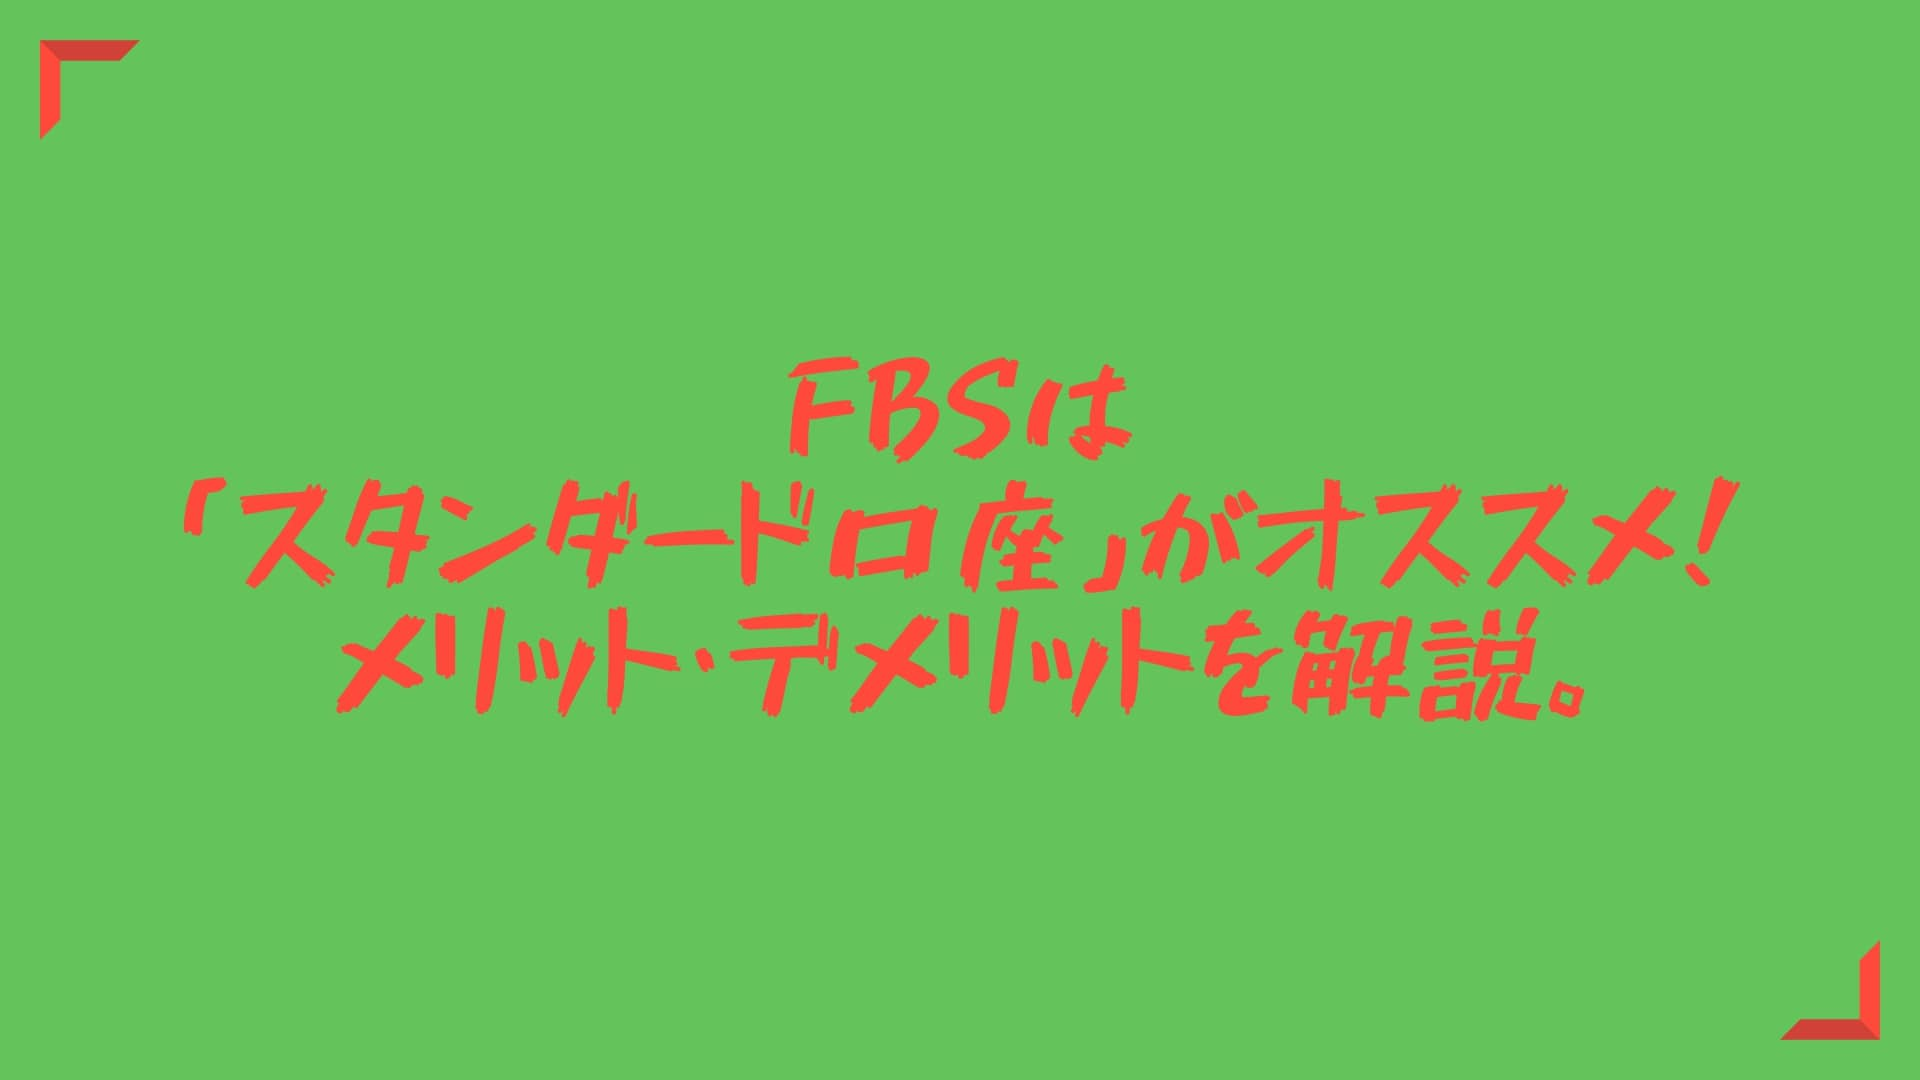 FBSは「スタンダード口座」がオススメ!メリット・デメリットを解説。